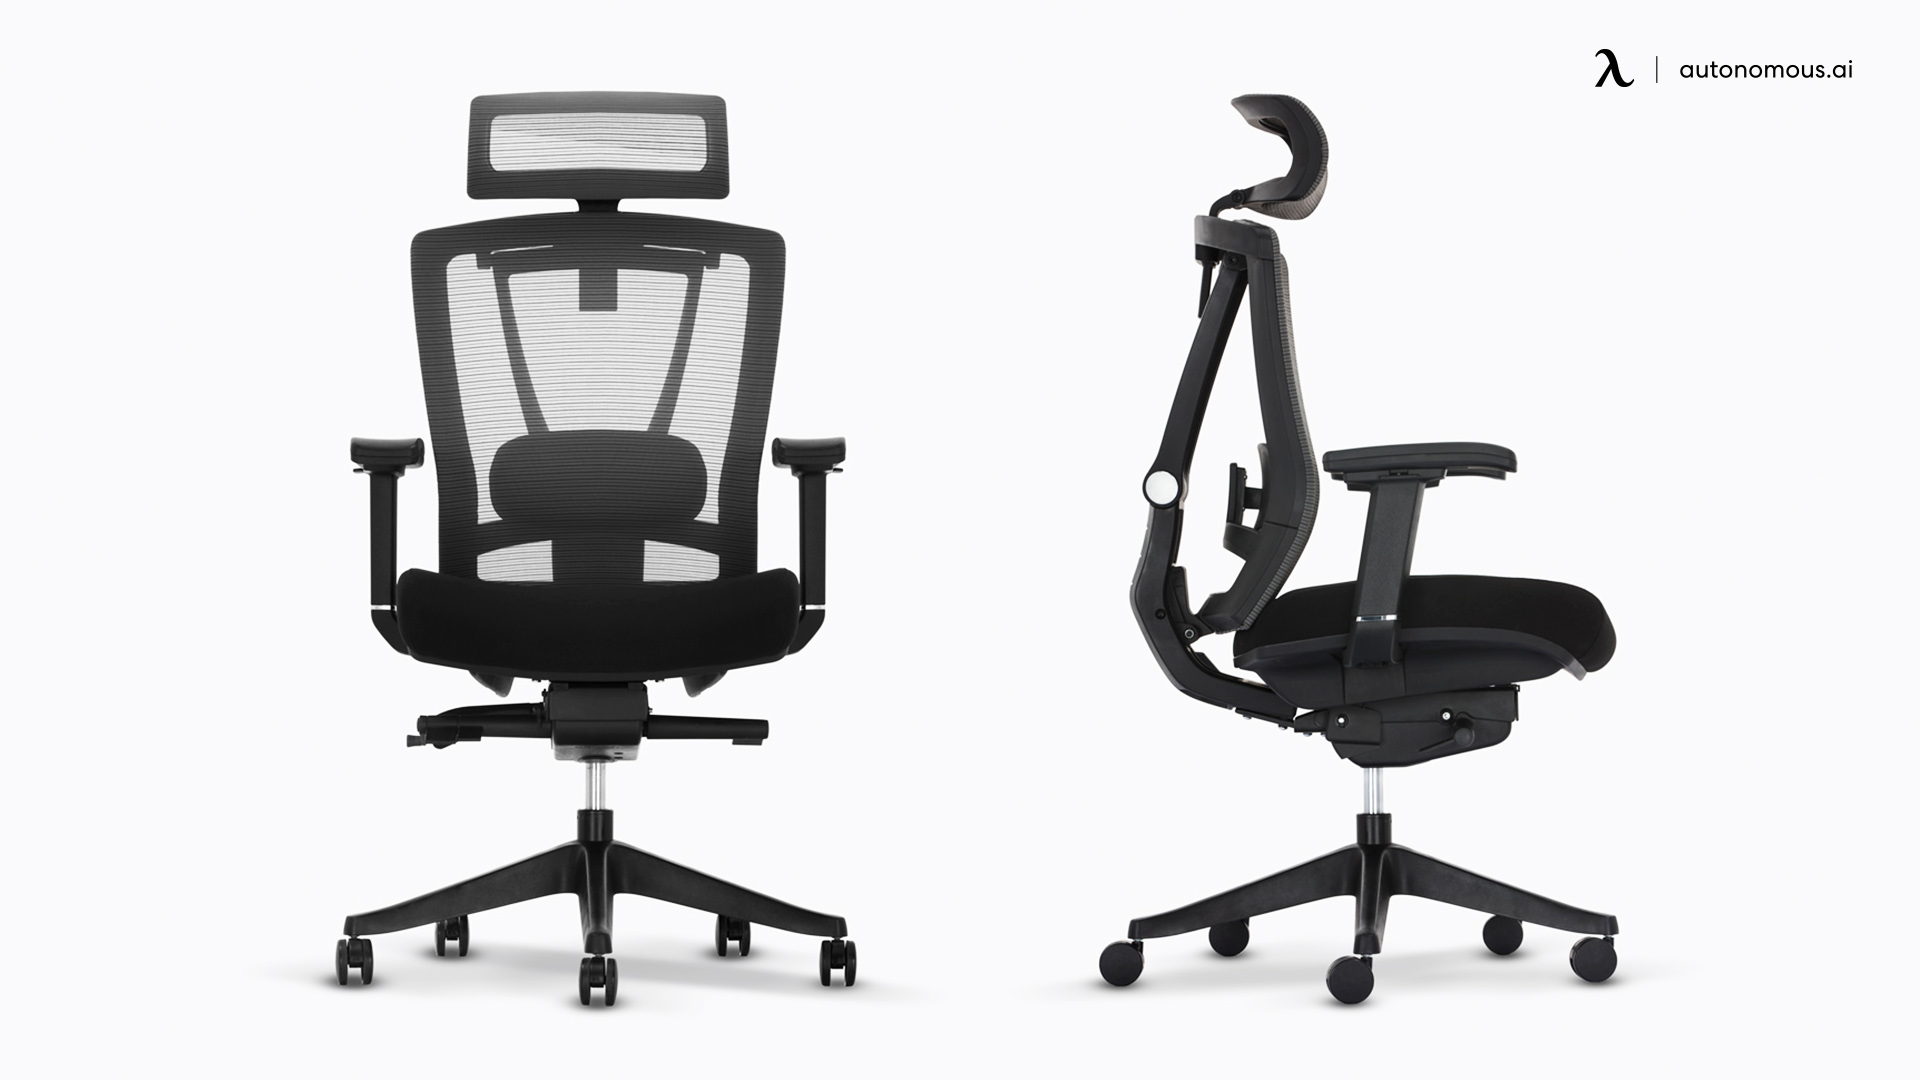 ErgoChair 2 - Best Office Chair for Upper Back Pain